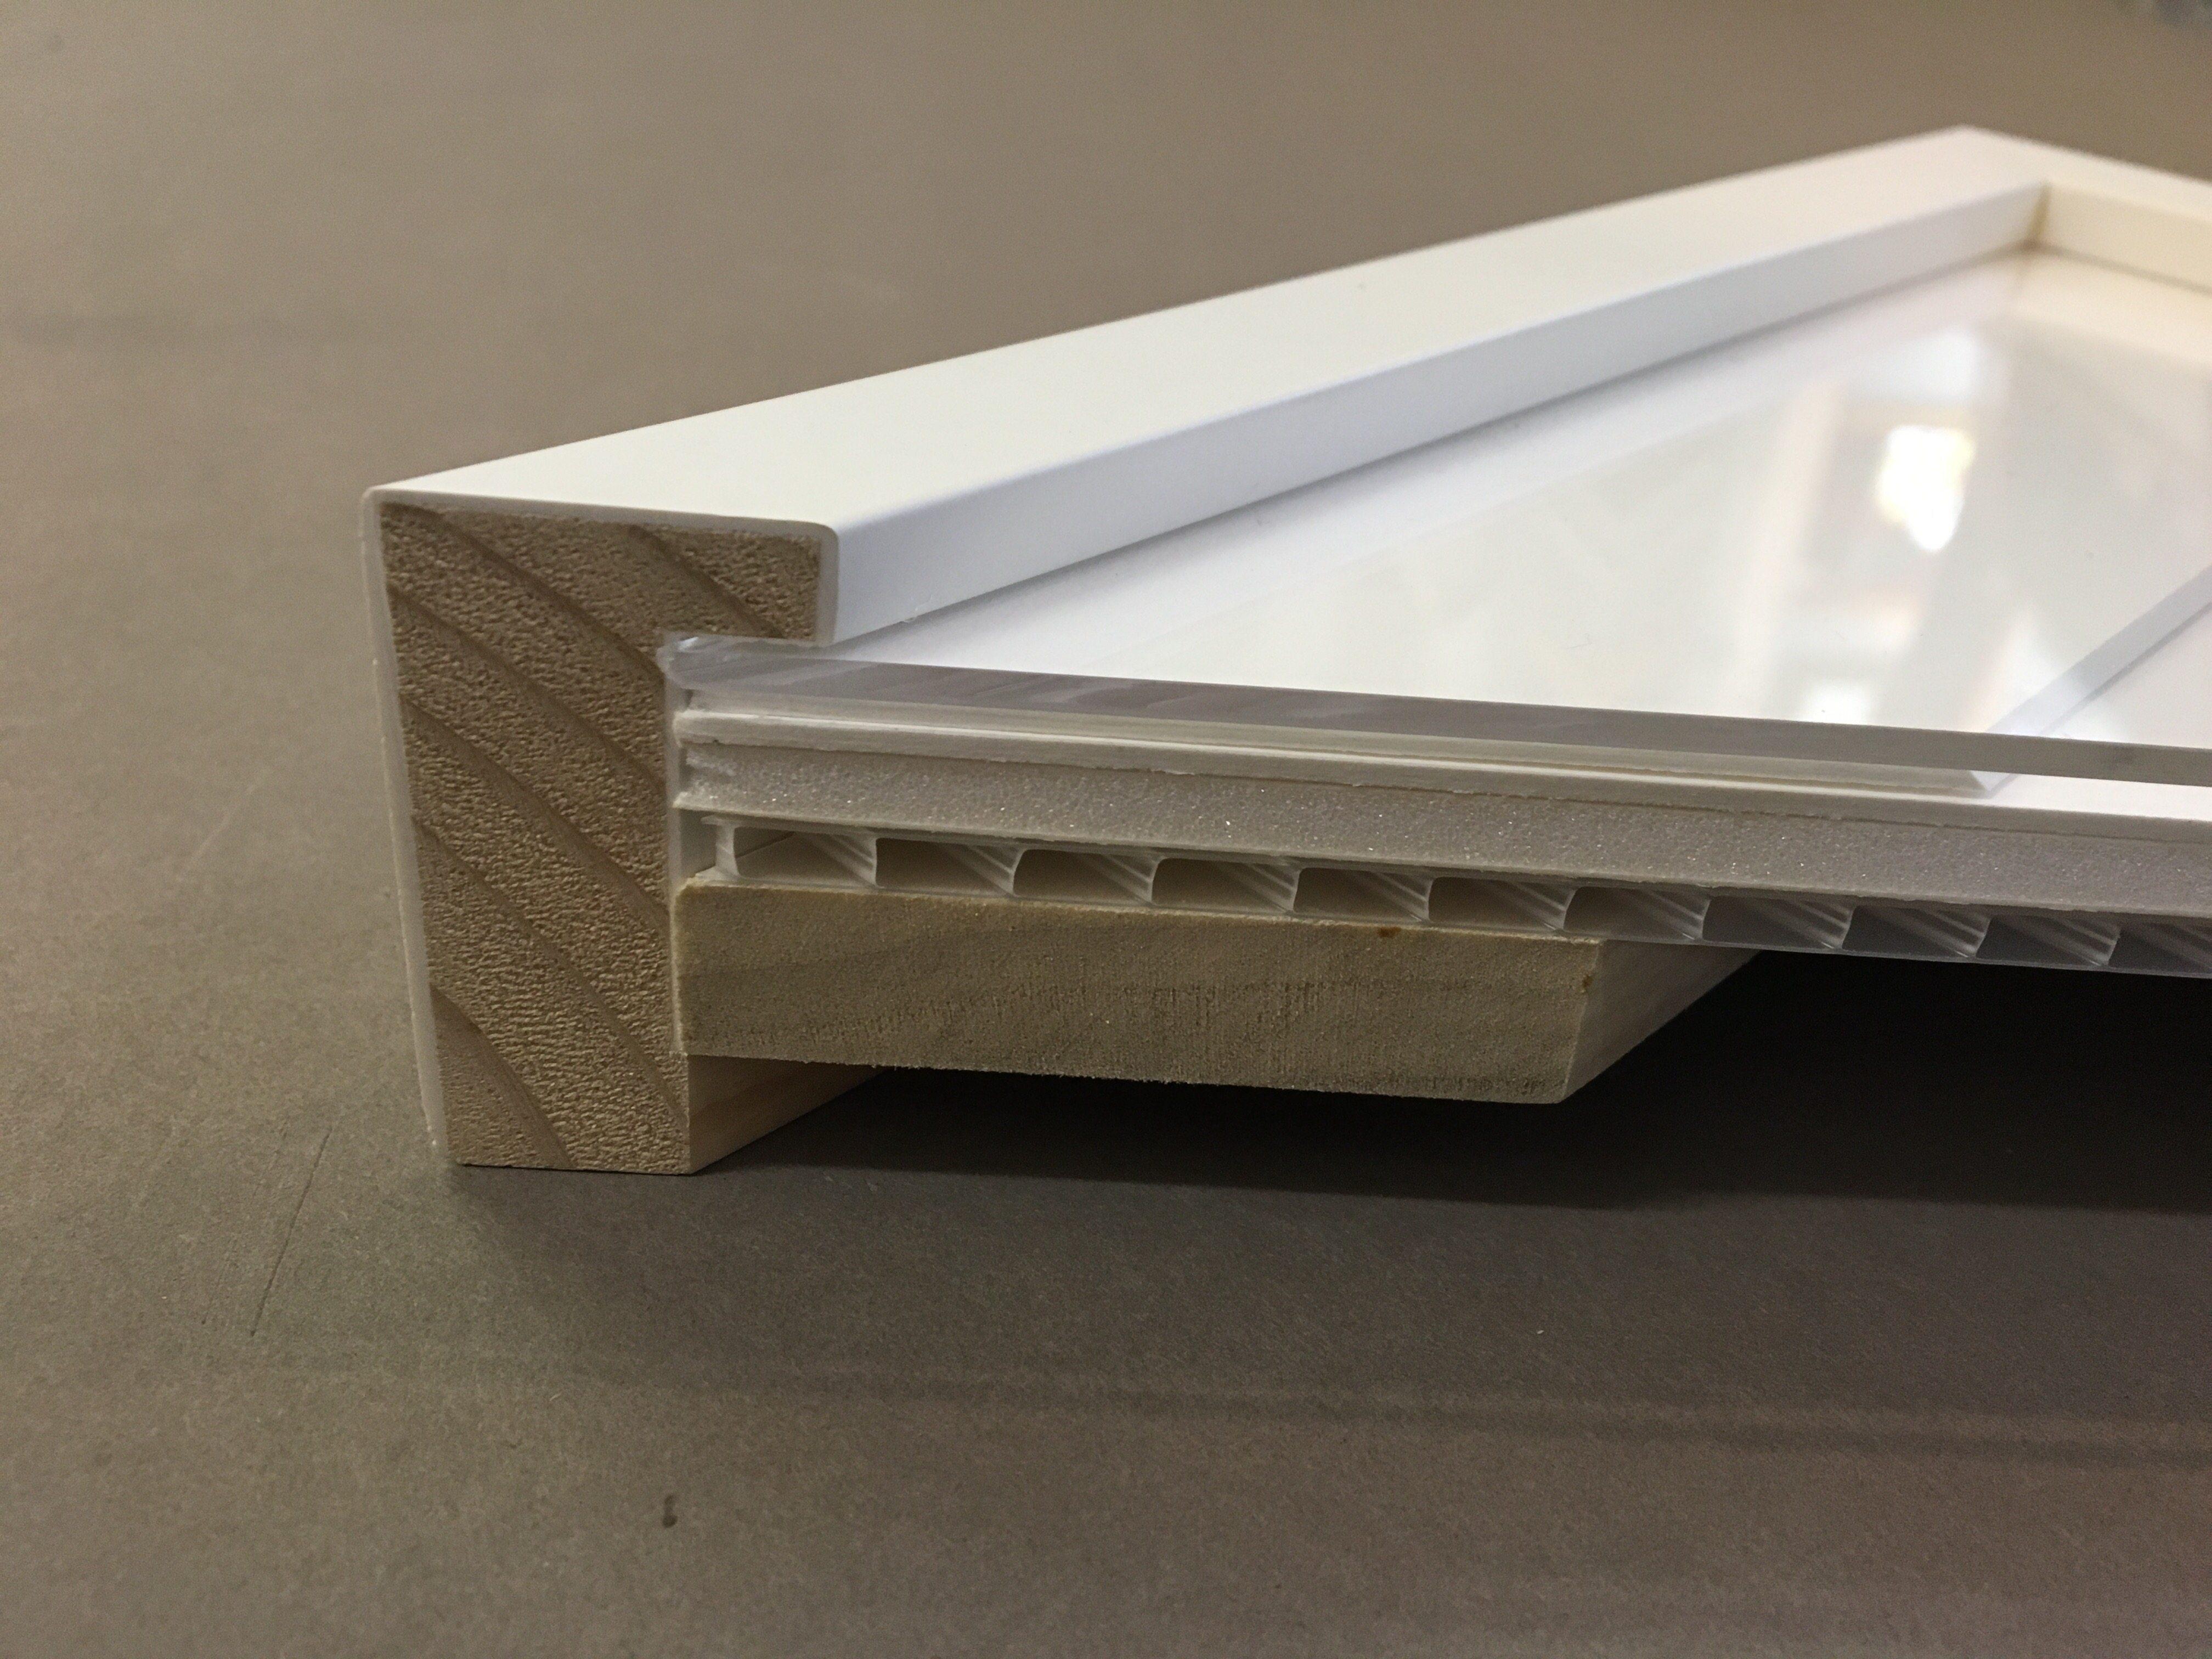 Cross section through a custom strainer reinforced frame